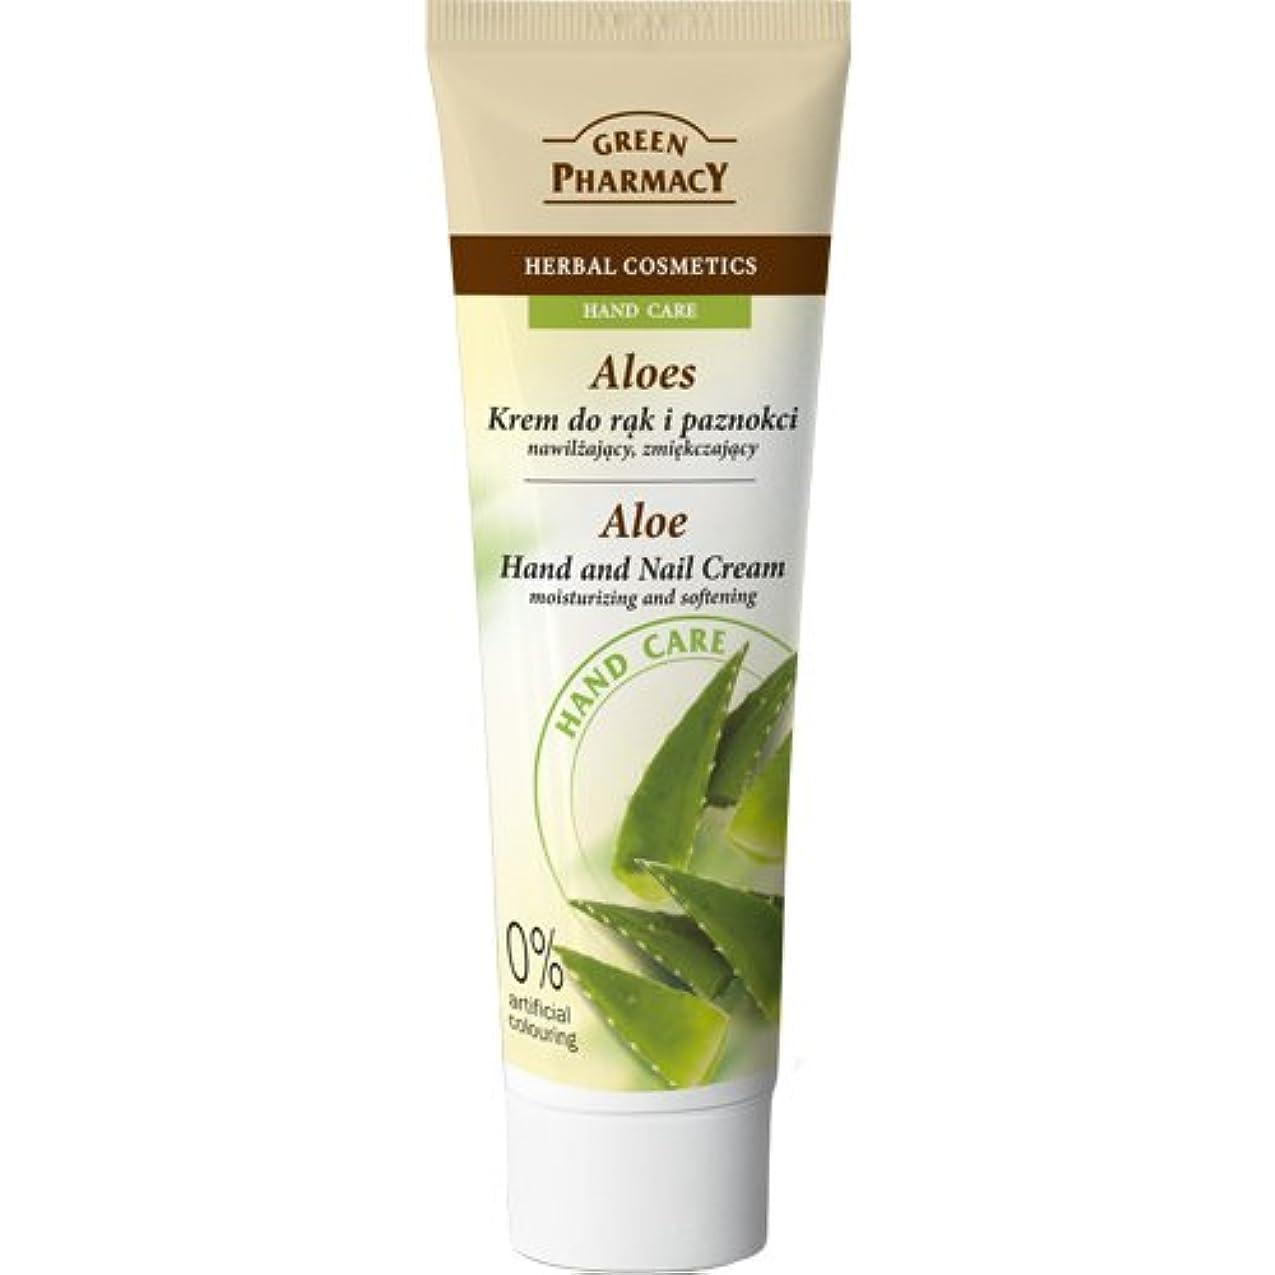 Elfa Pharm Green Pharmacy グリーンファーマシー Hand&Nail Cream ハンド&ネイルクリーム Aloe アロエ